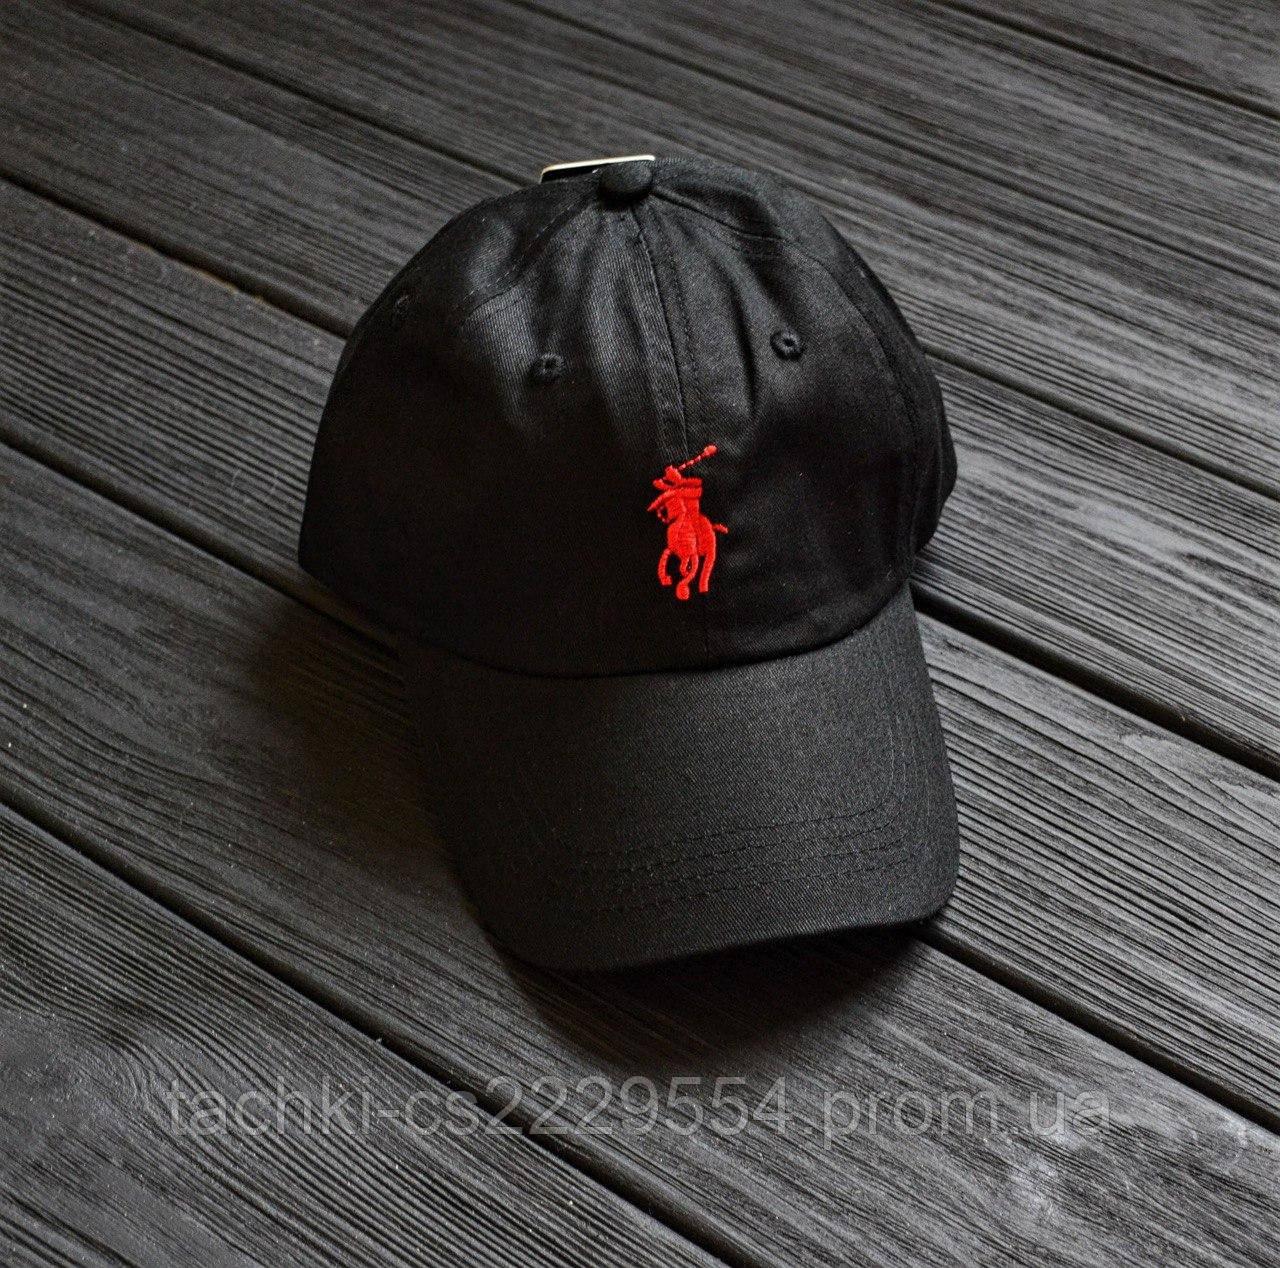 Кепка Polo Ralph Lauren black&red.